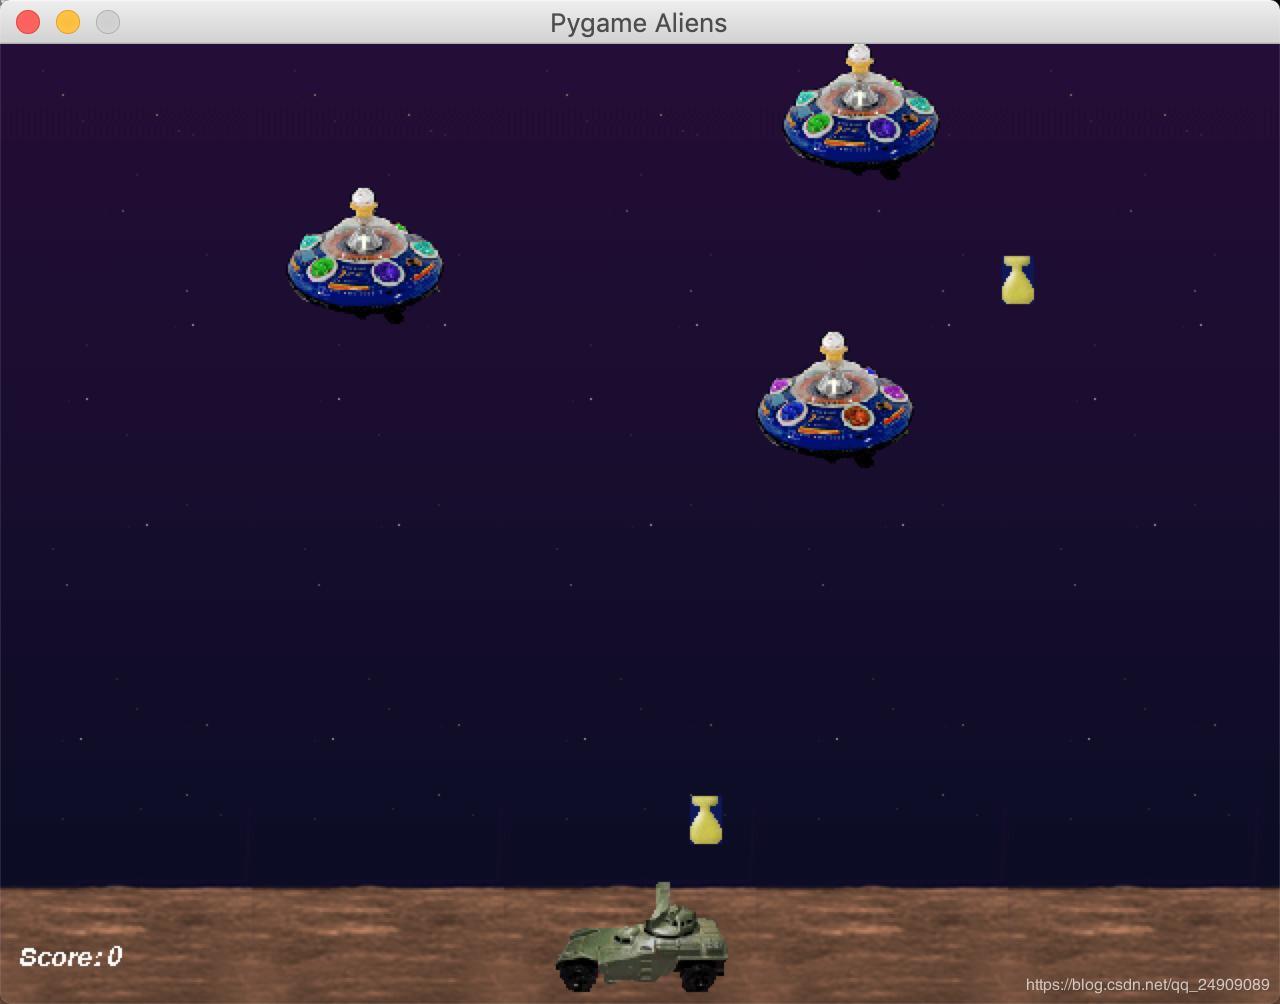 Python mac running pygame blank - solution - Programmer Sought